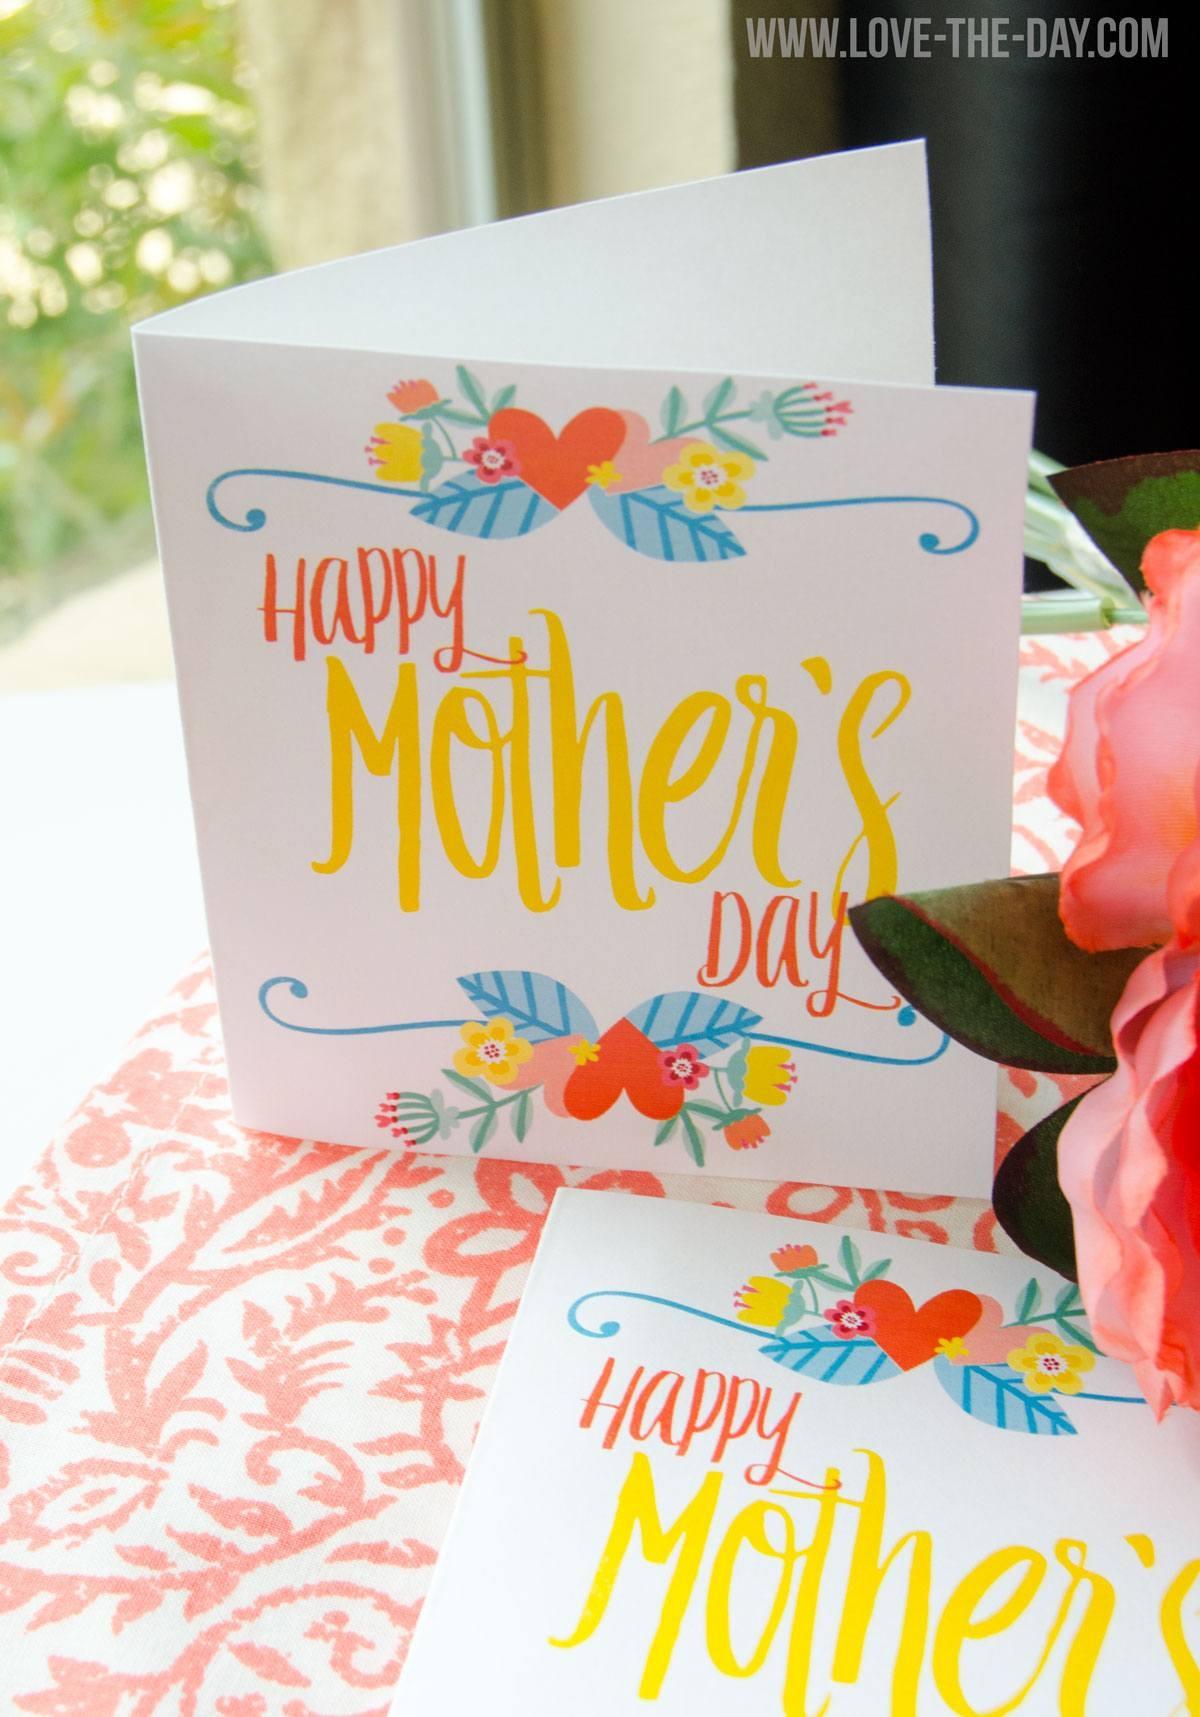 Free Printable Mother's Day Cardlindi Haws Of Love The Day - Free Printable Mothers Day Cards No Download